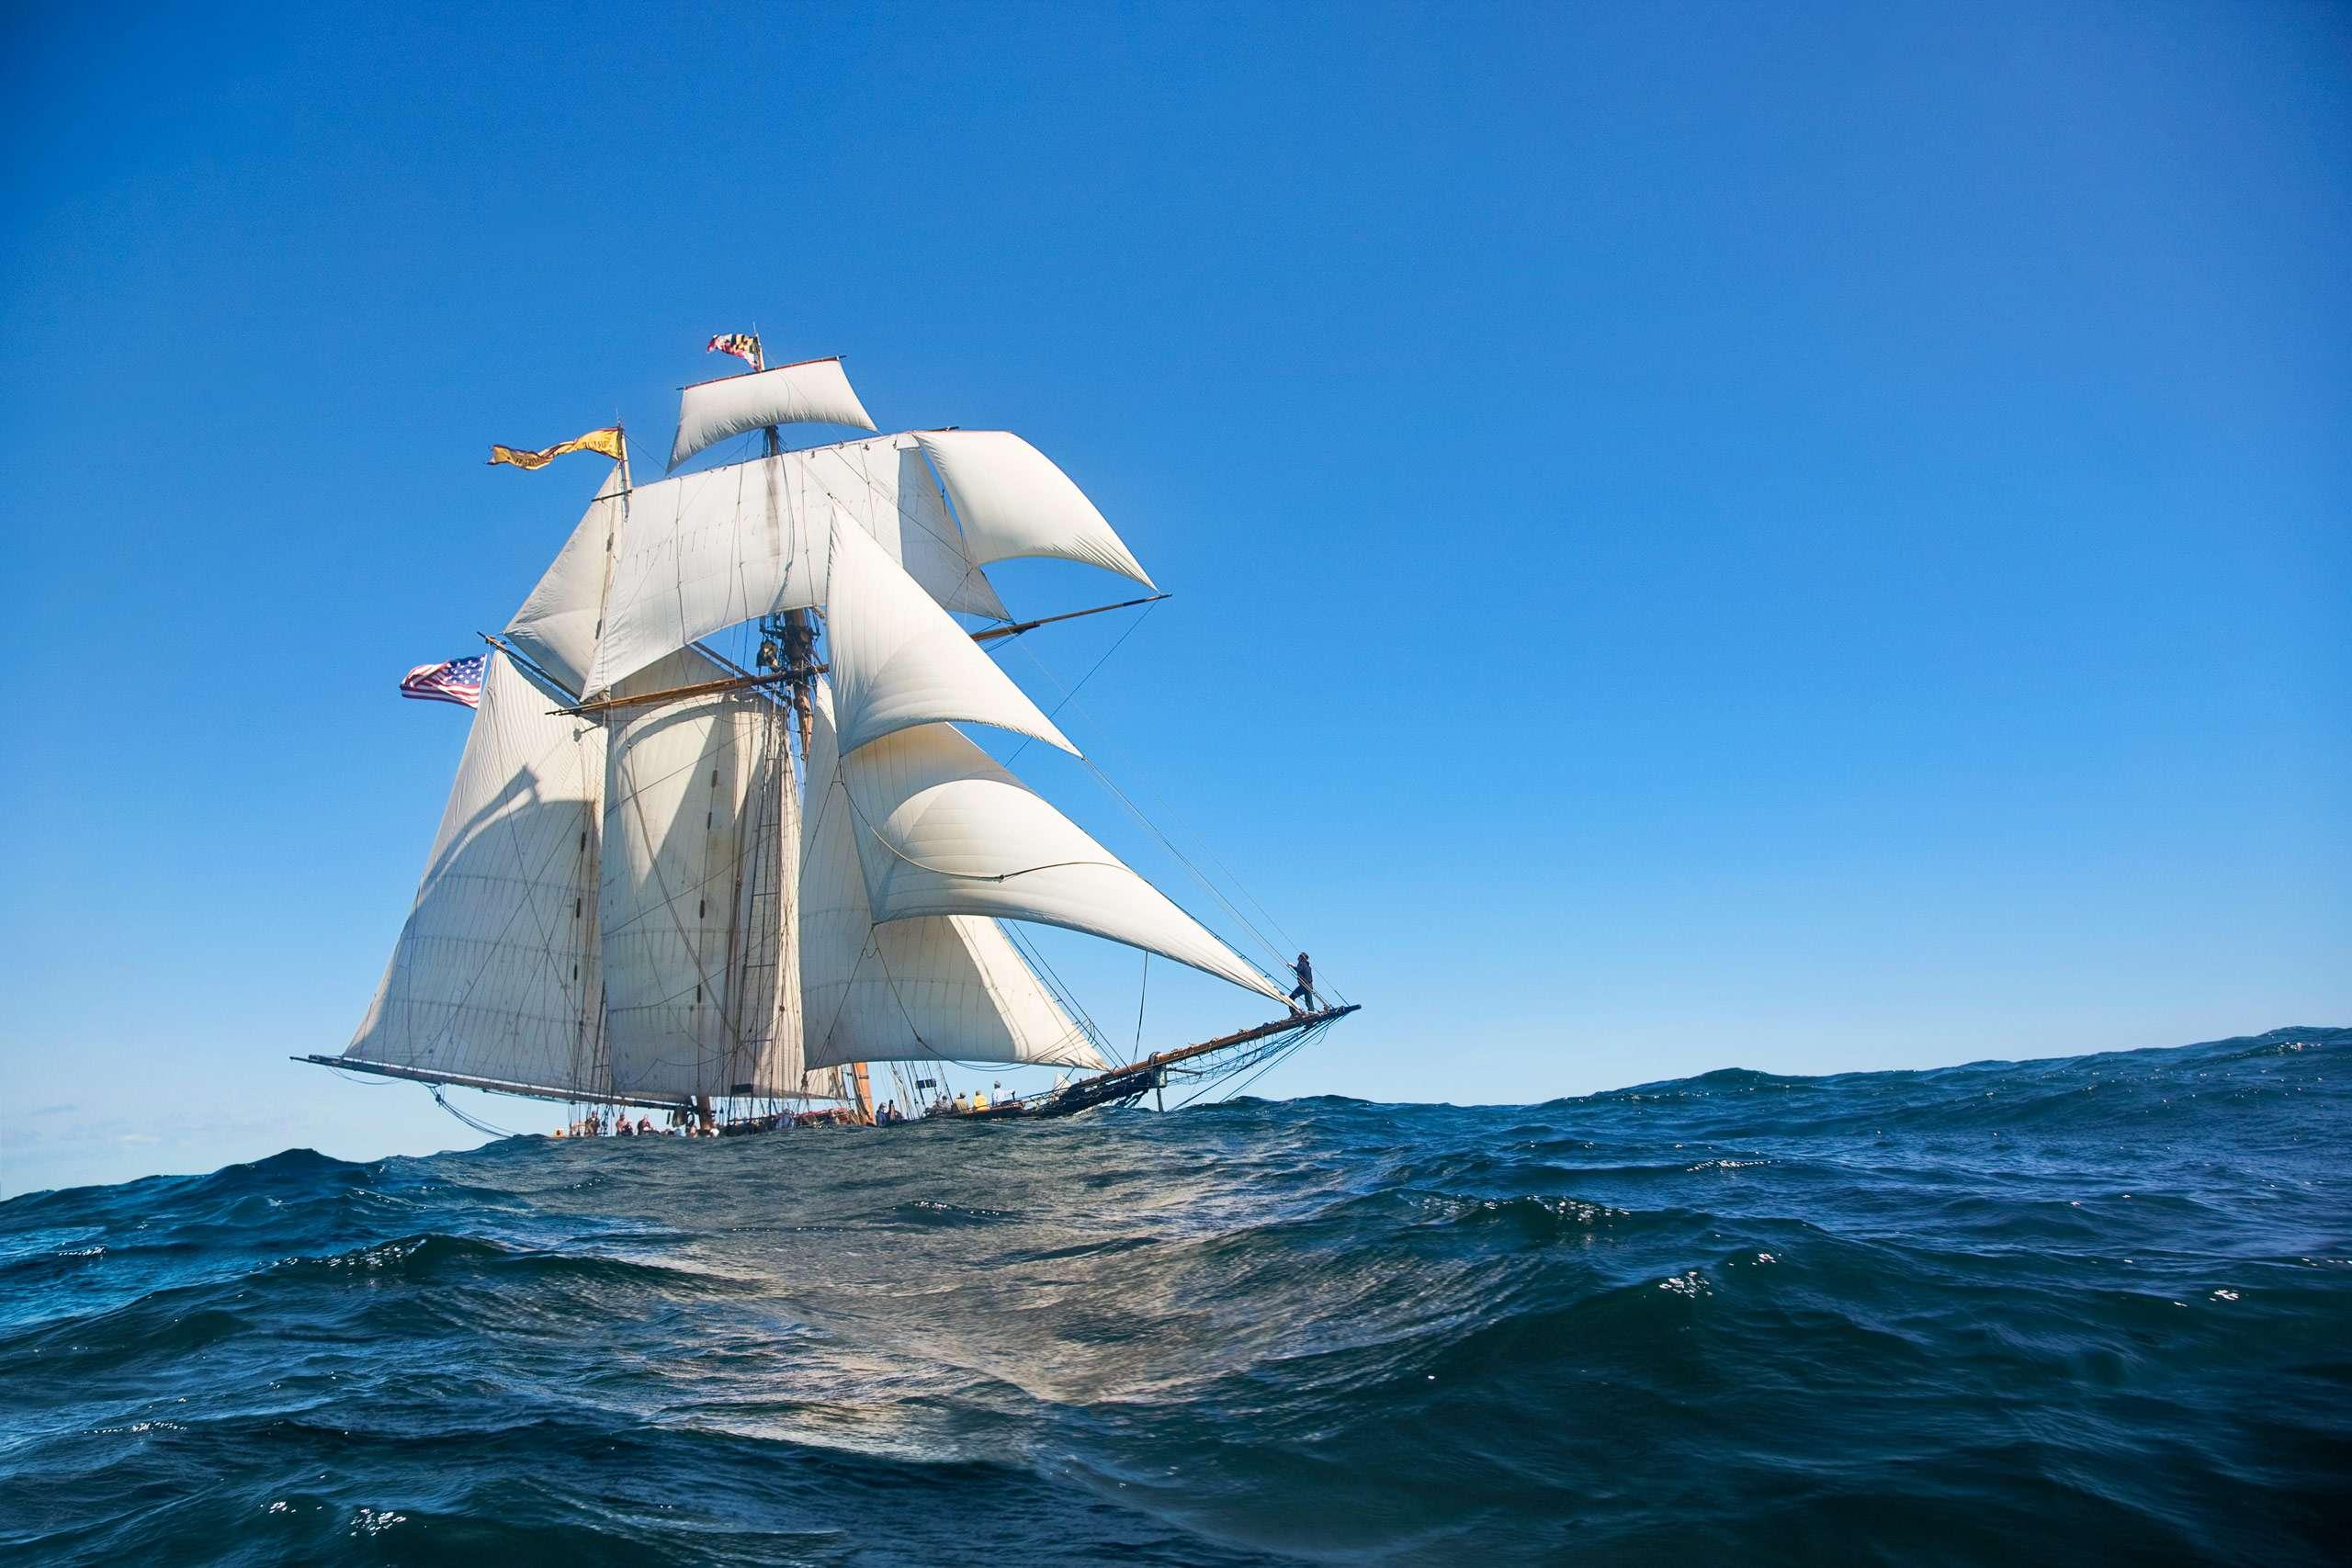 PORTFOLIO - Sailing - Windjammers #9   PCG447